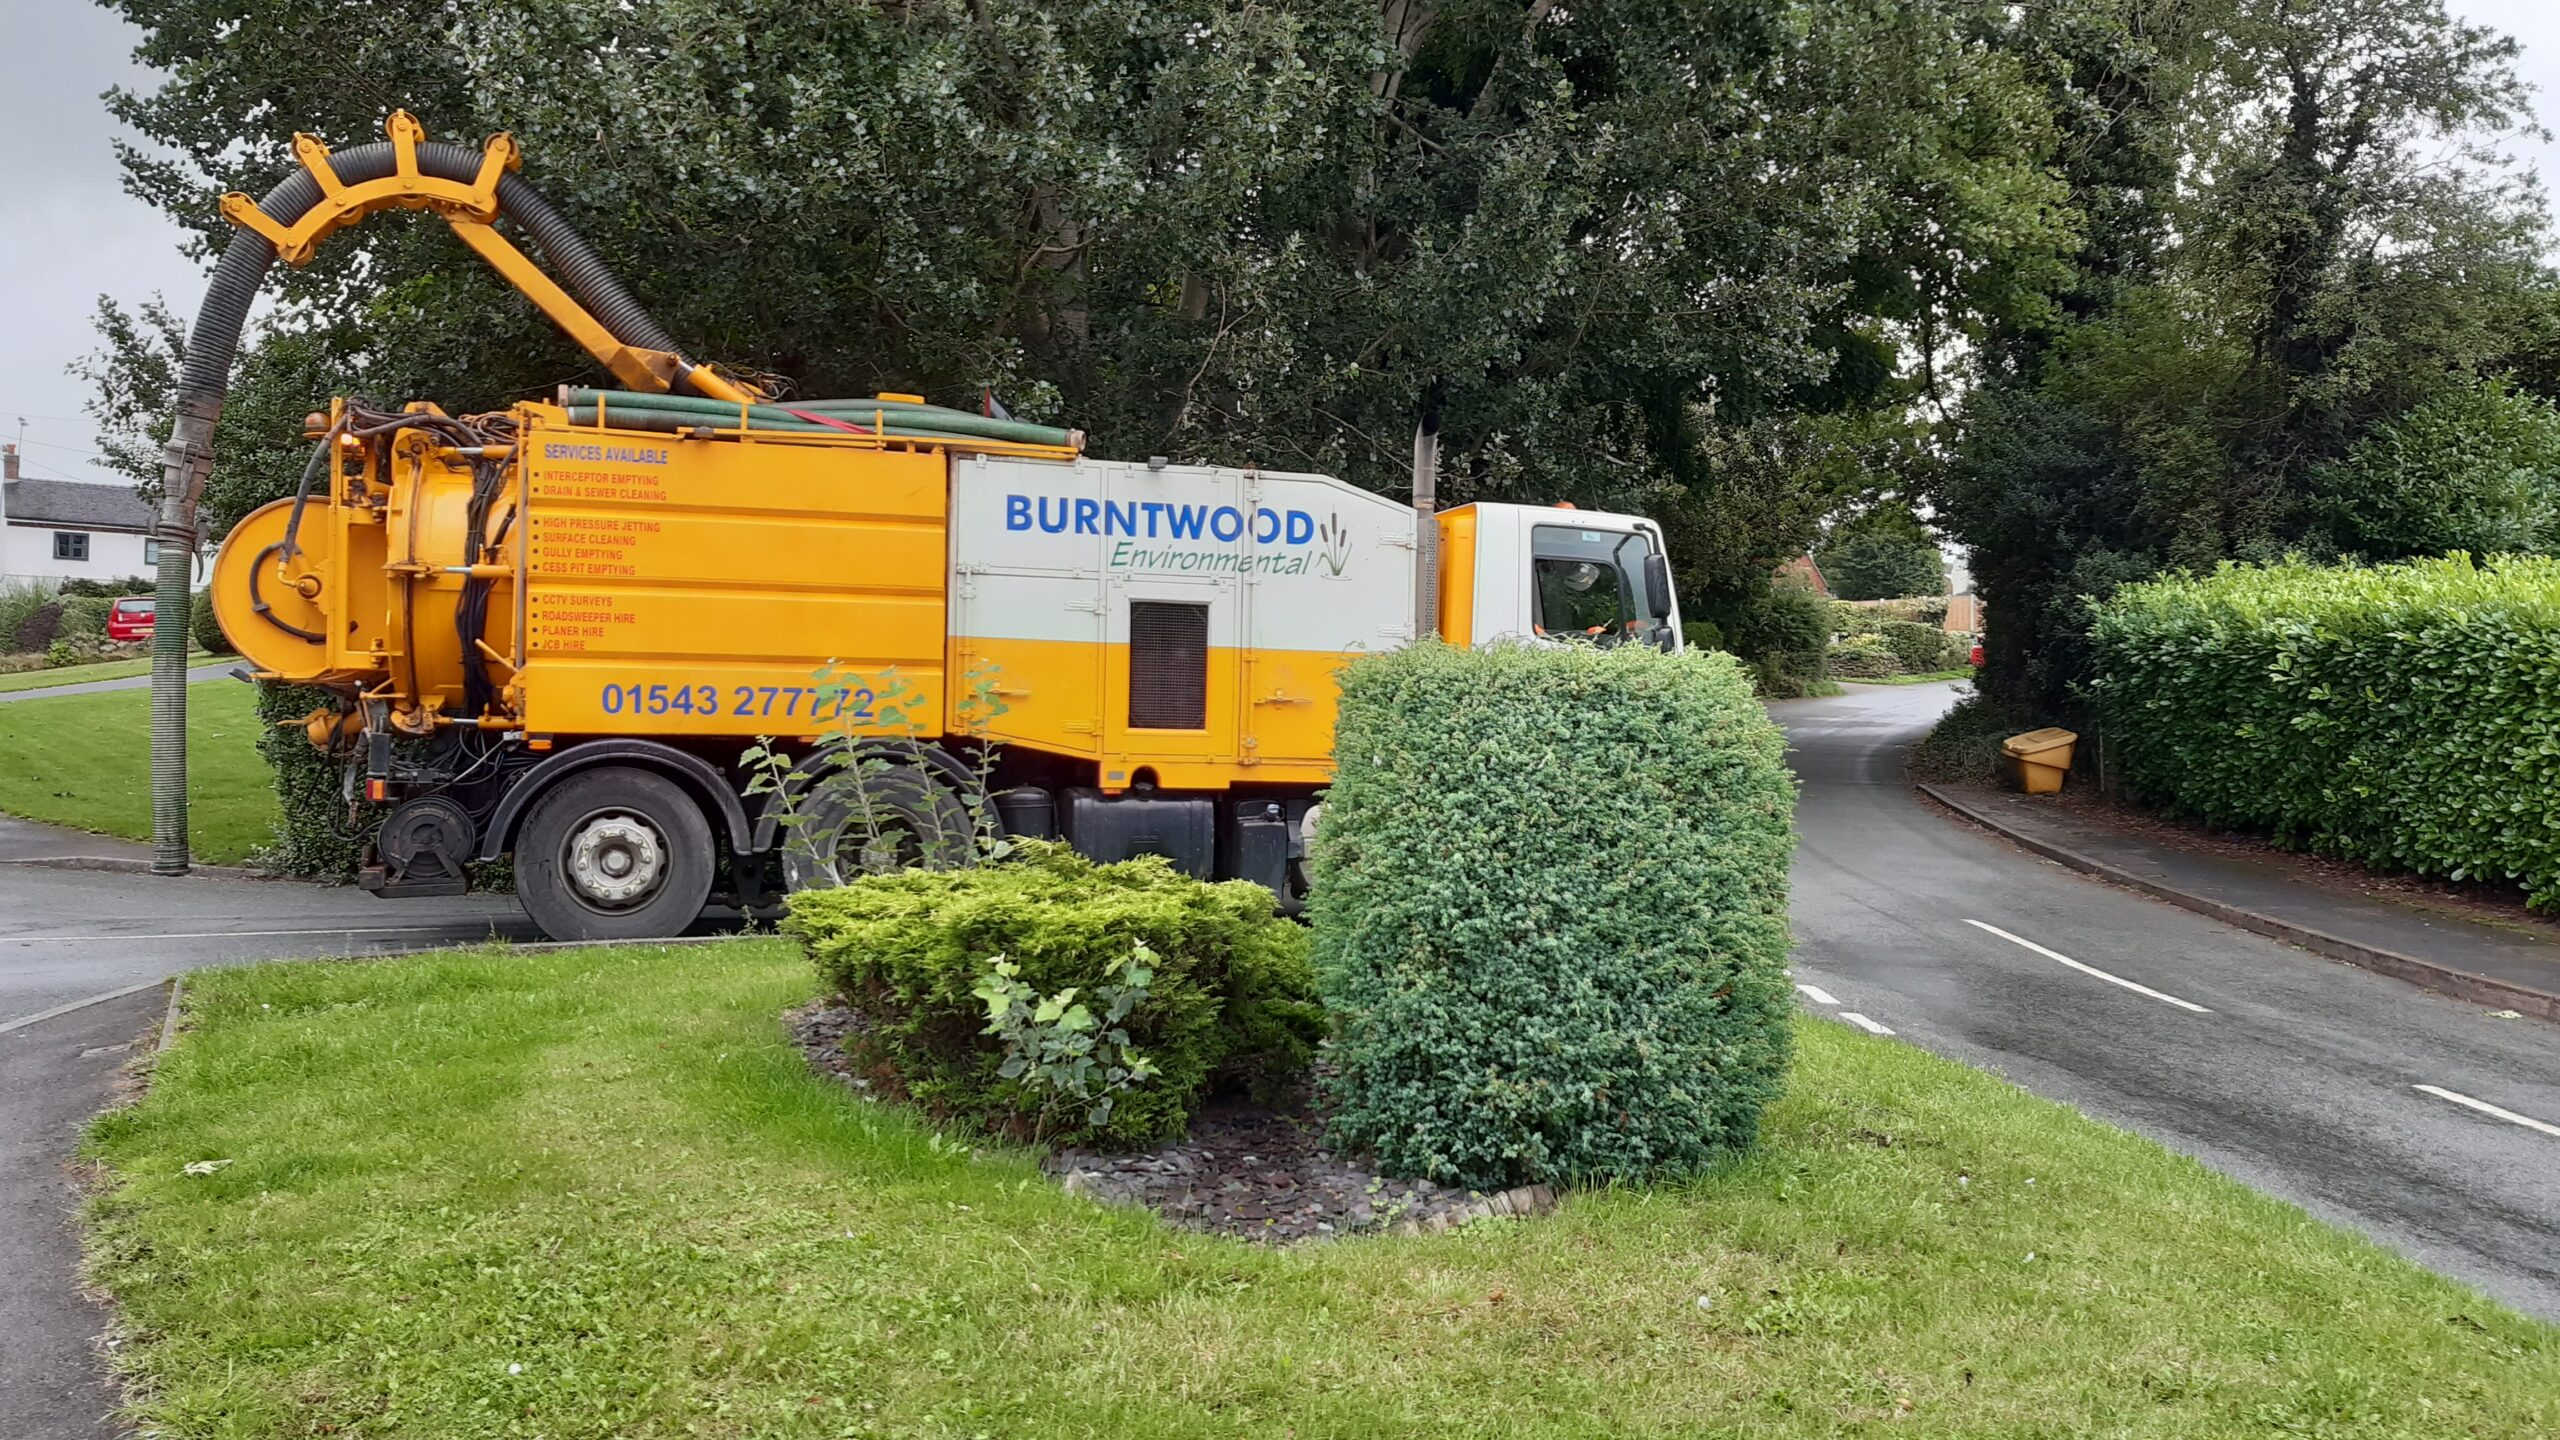 20200827_Burntwood Contractor vehicle in Hixonjpeg